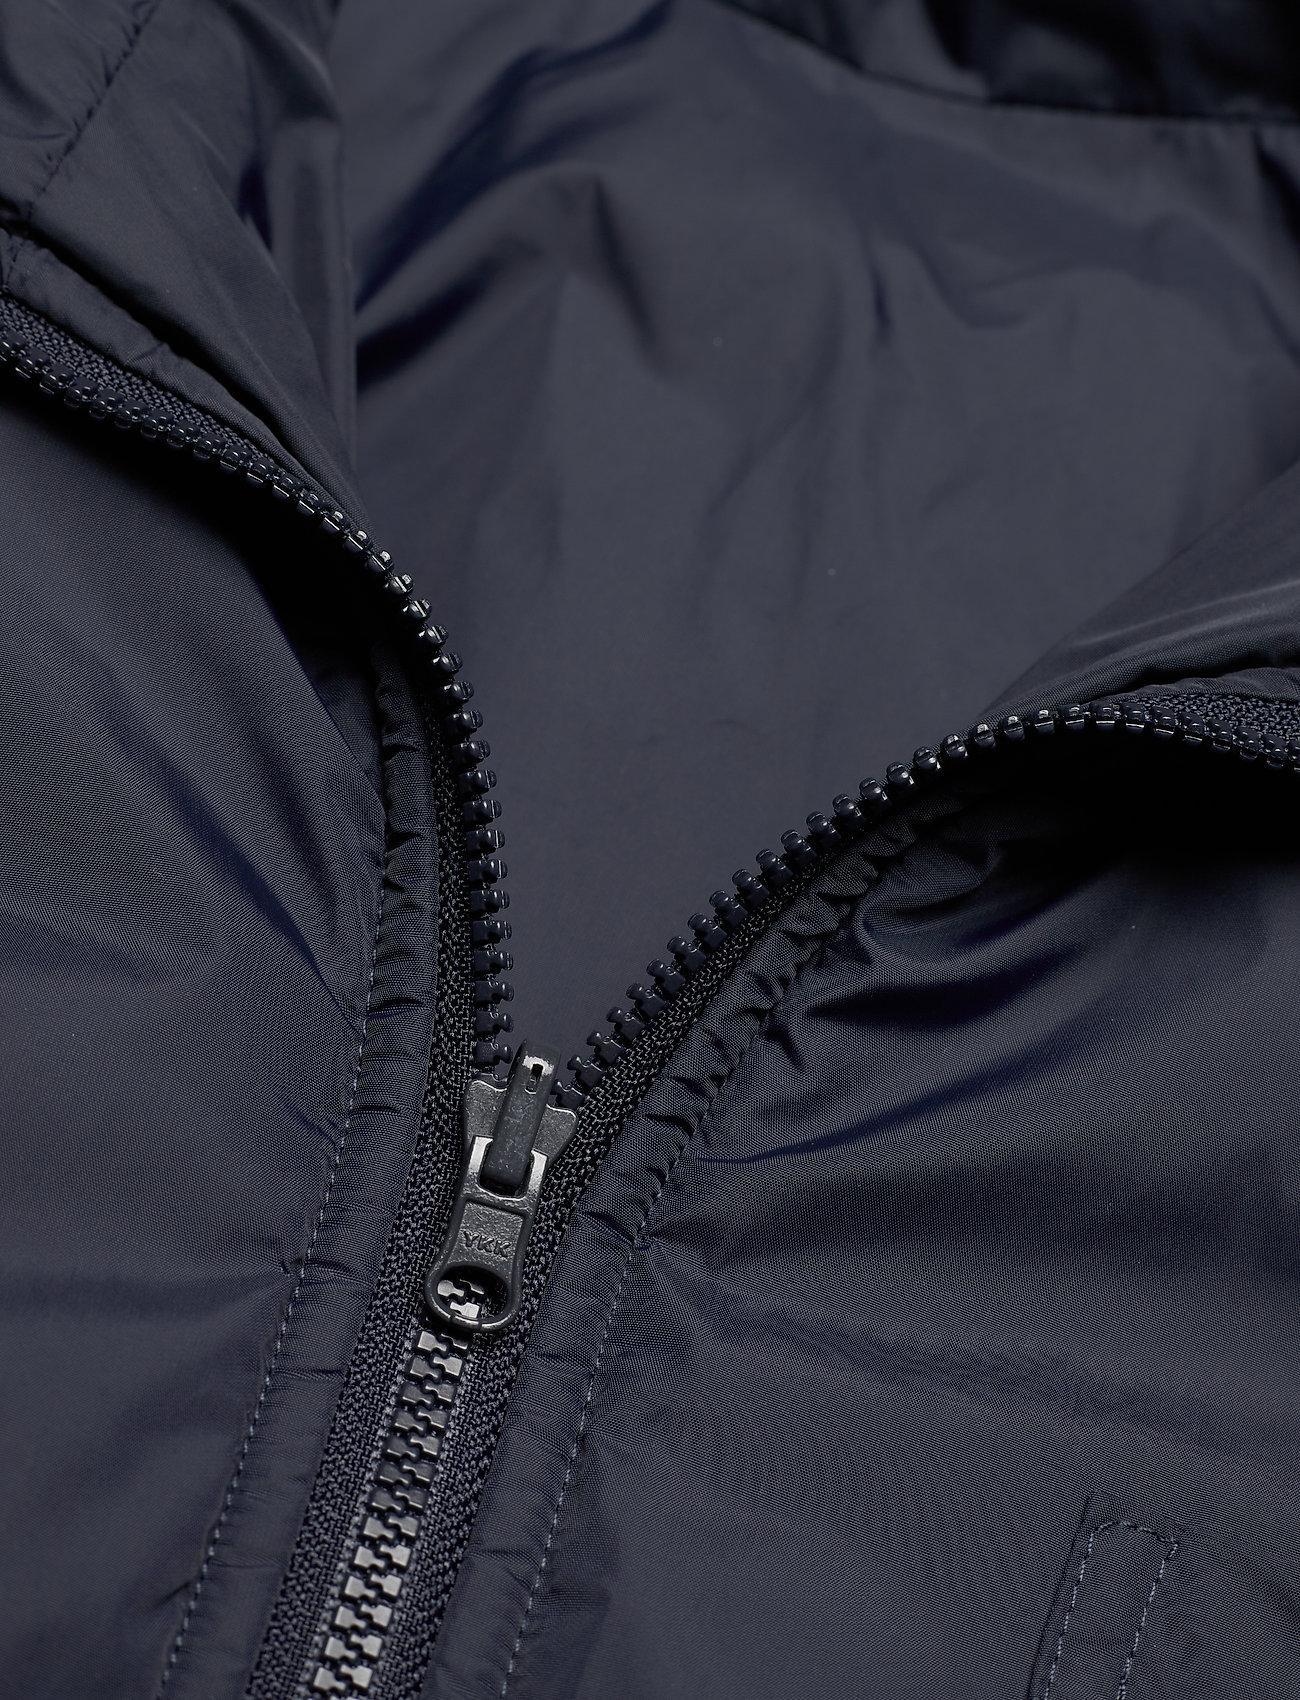 Samsøe Samsøe Misam jacket 11234 - Jakker NIGHT SKY - Menn Klær